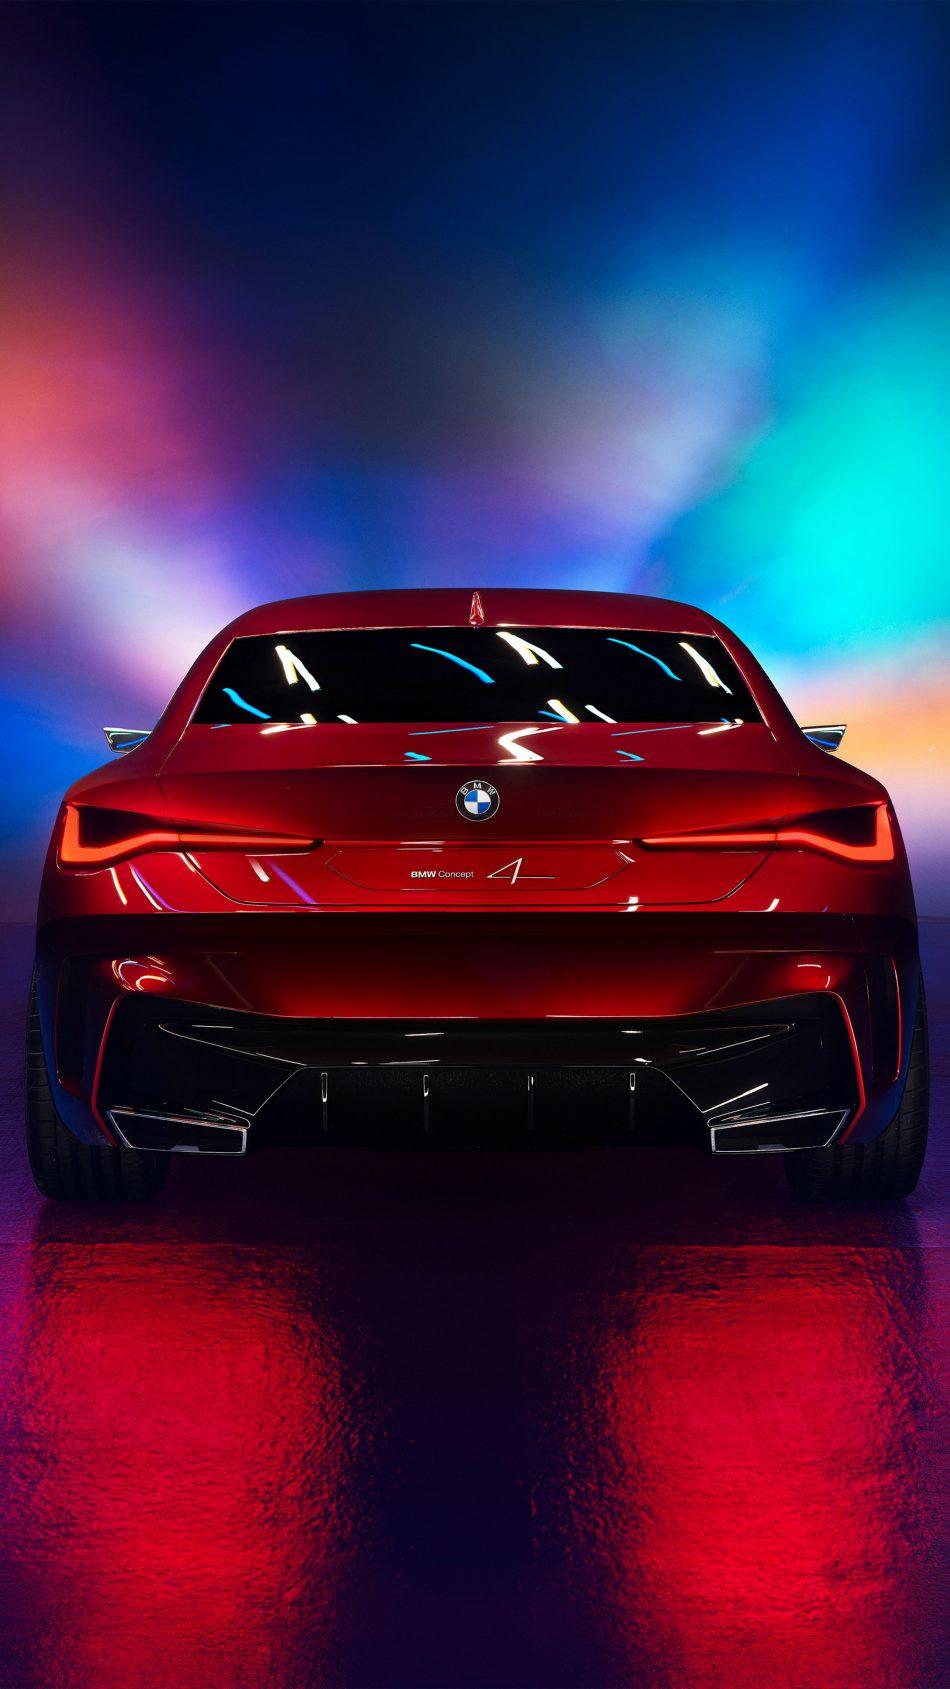 BMW Concept 4 2019 4K Ultra HD Mobile Wallpaper